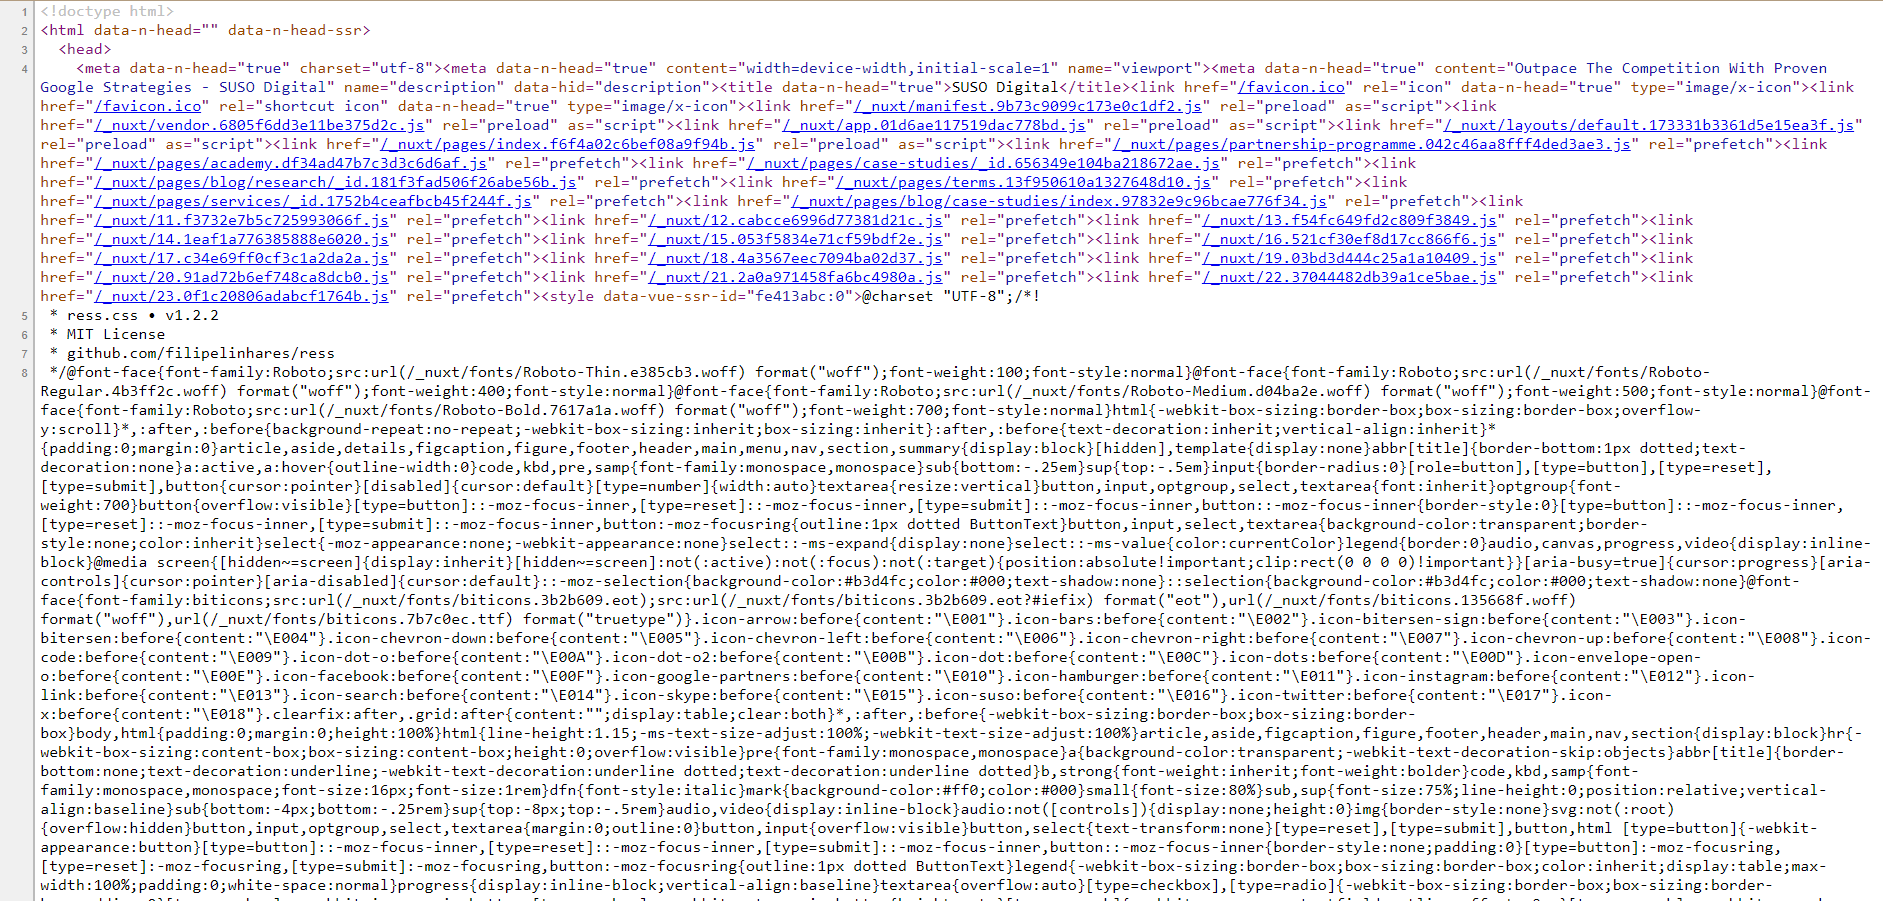 susodigital.com website source code